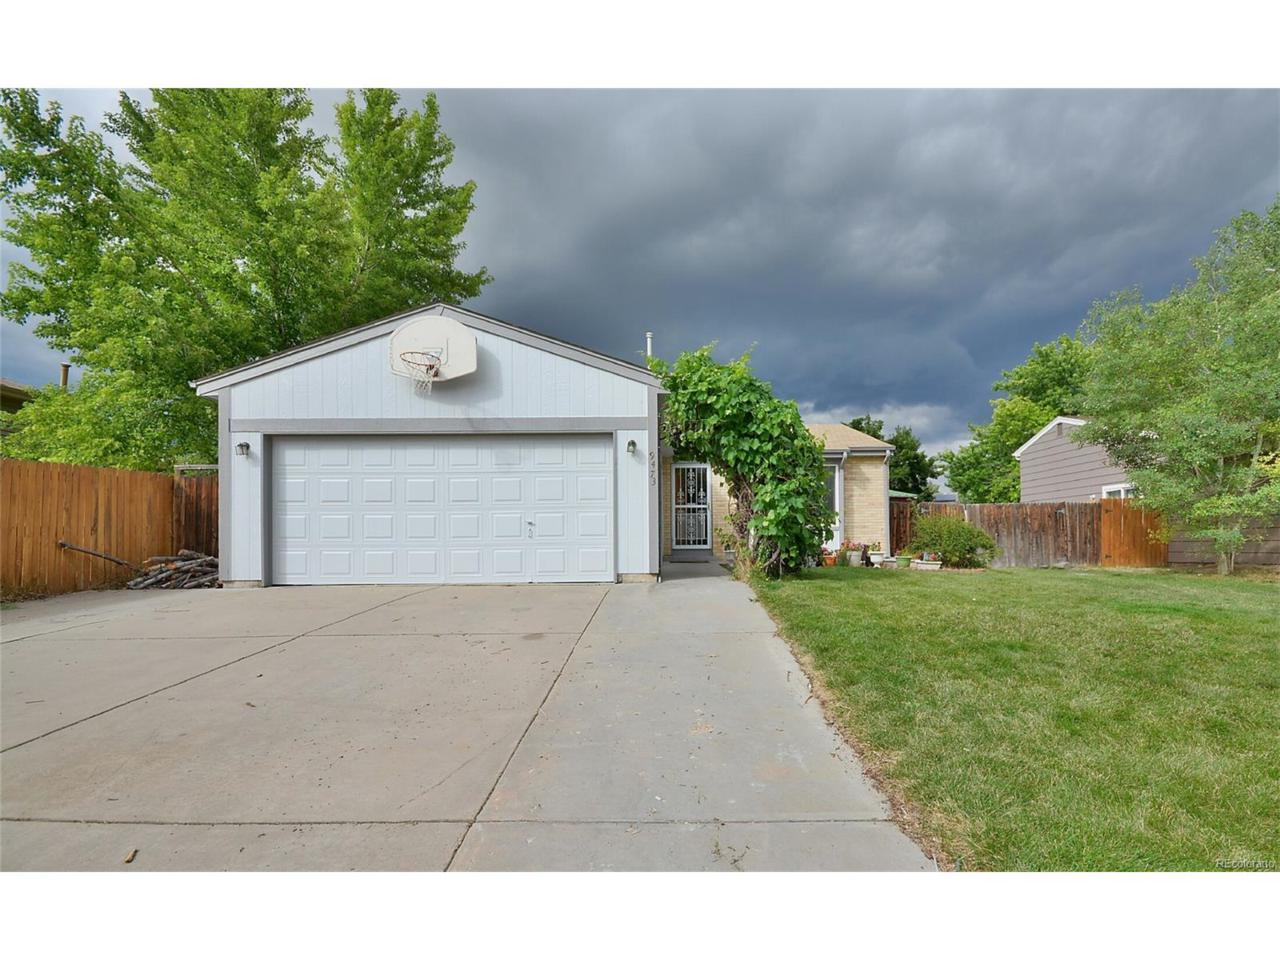 9473 W Saratoga Place, Denver, CO 80123 (MLS #5496835) :: 8z Real Estate